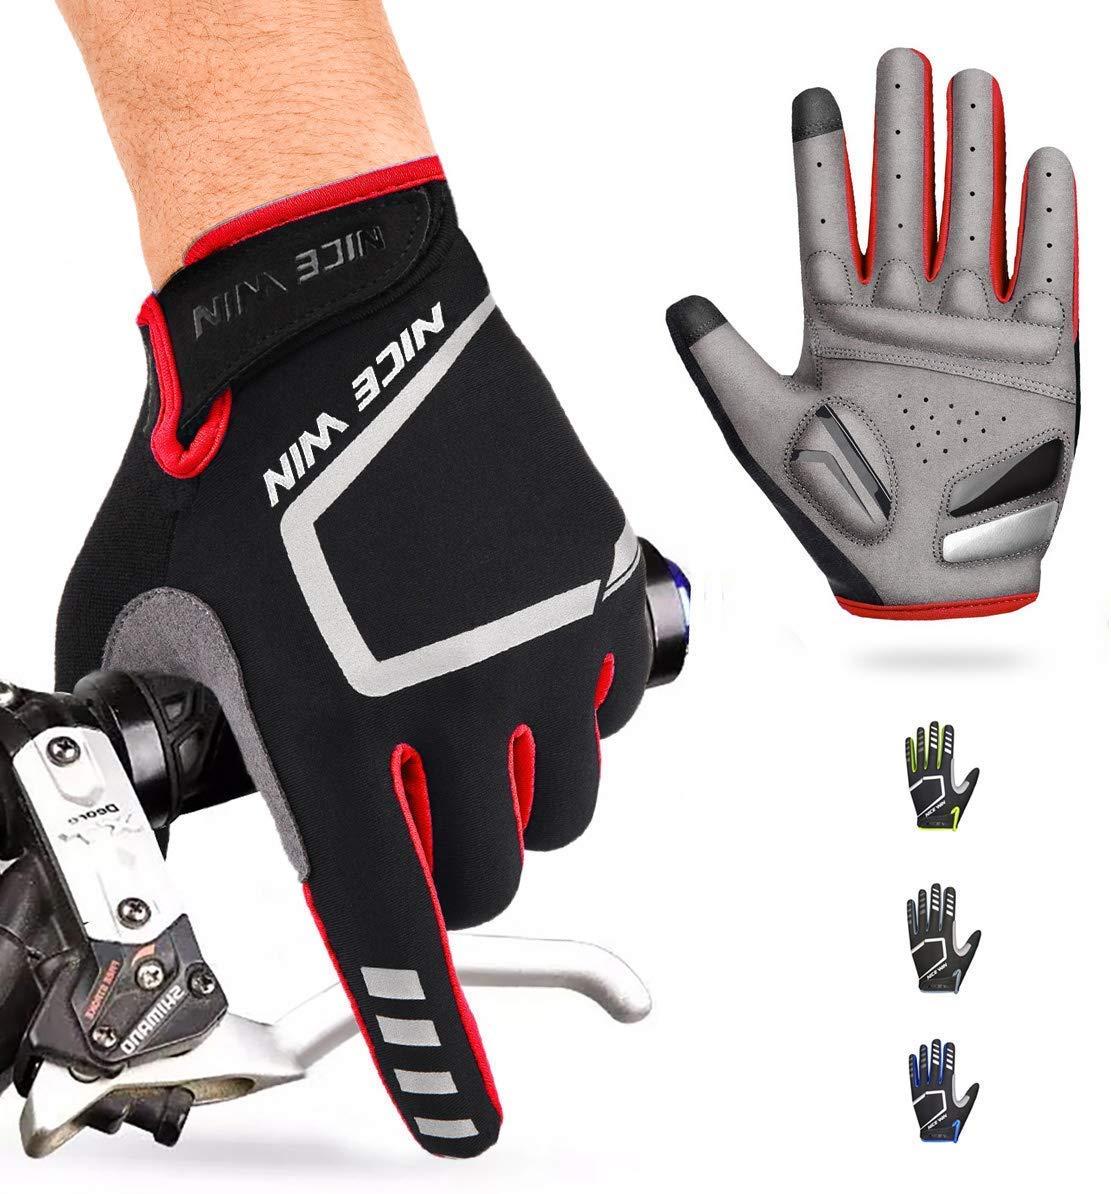 NICEWIN Winter Cycling Gloves Motorcycle Bike Windproof Waterproof Mountain Road Bicycle Glove Men Women Padded Antiskid Touch Screen Design